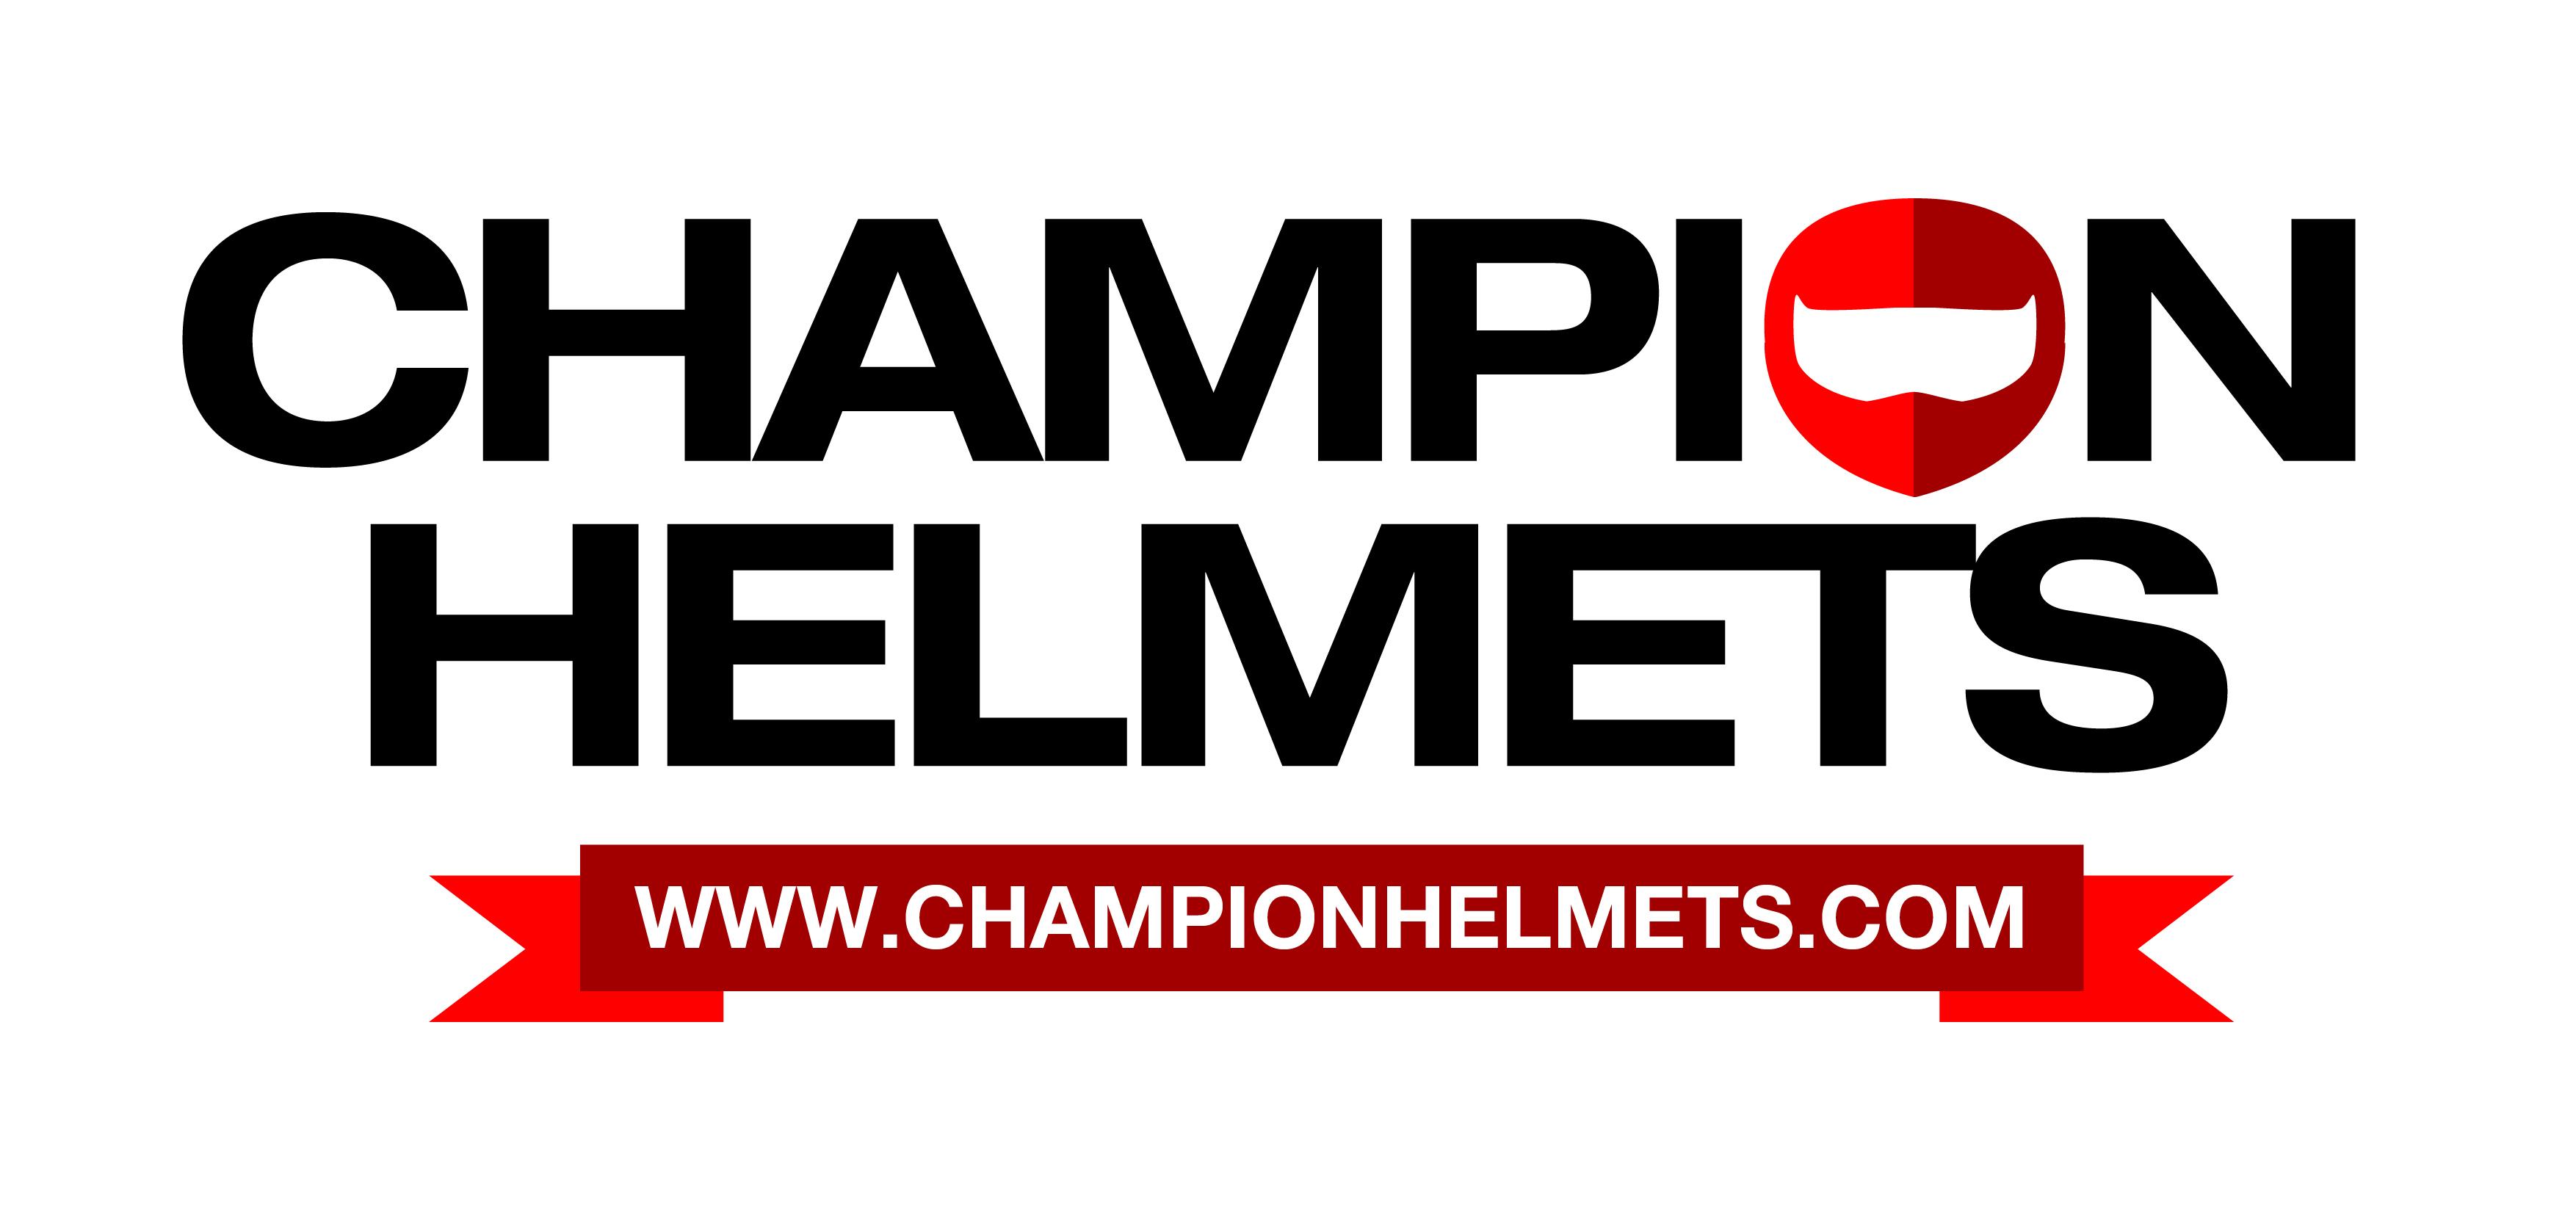 Championhelmets.com